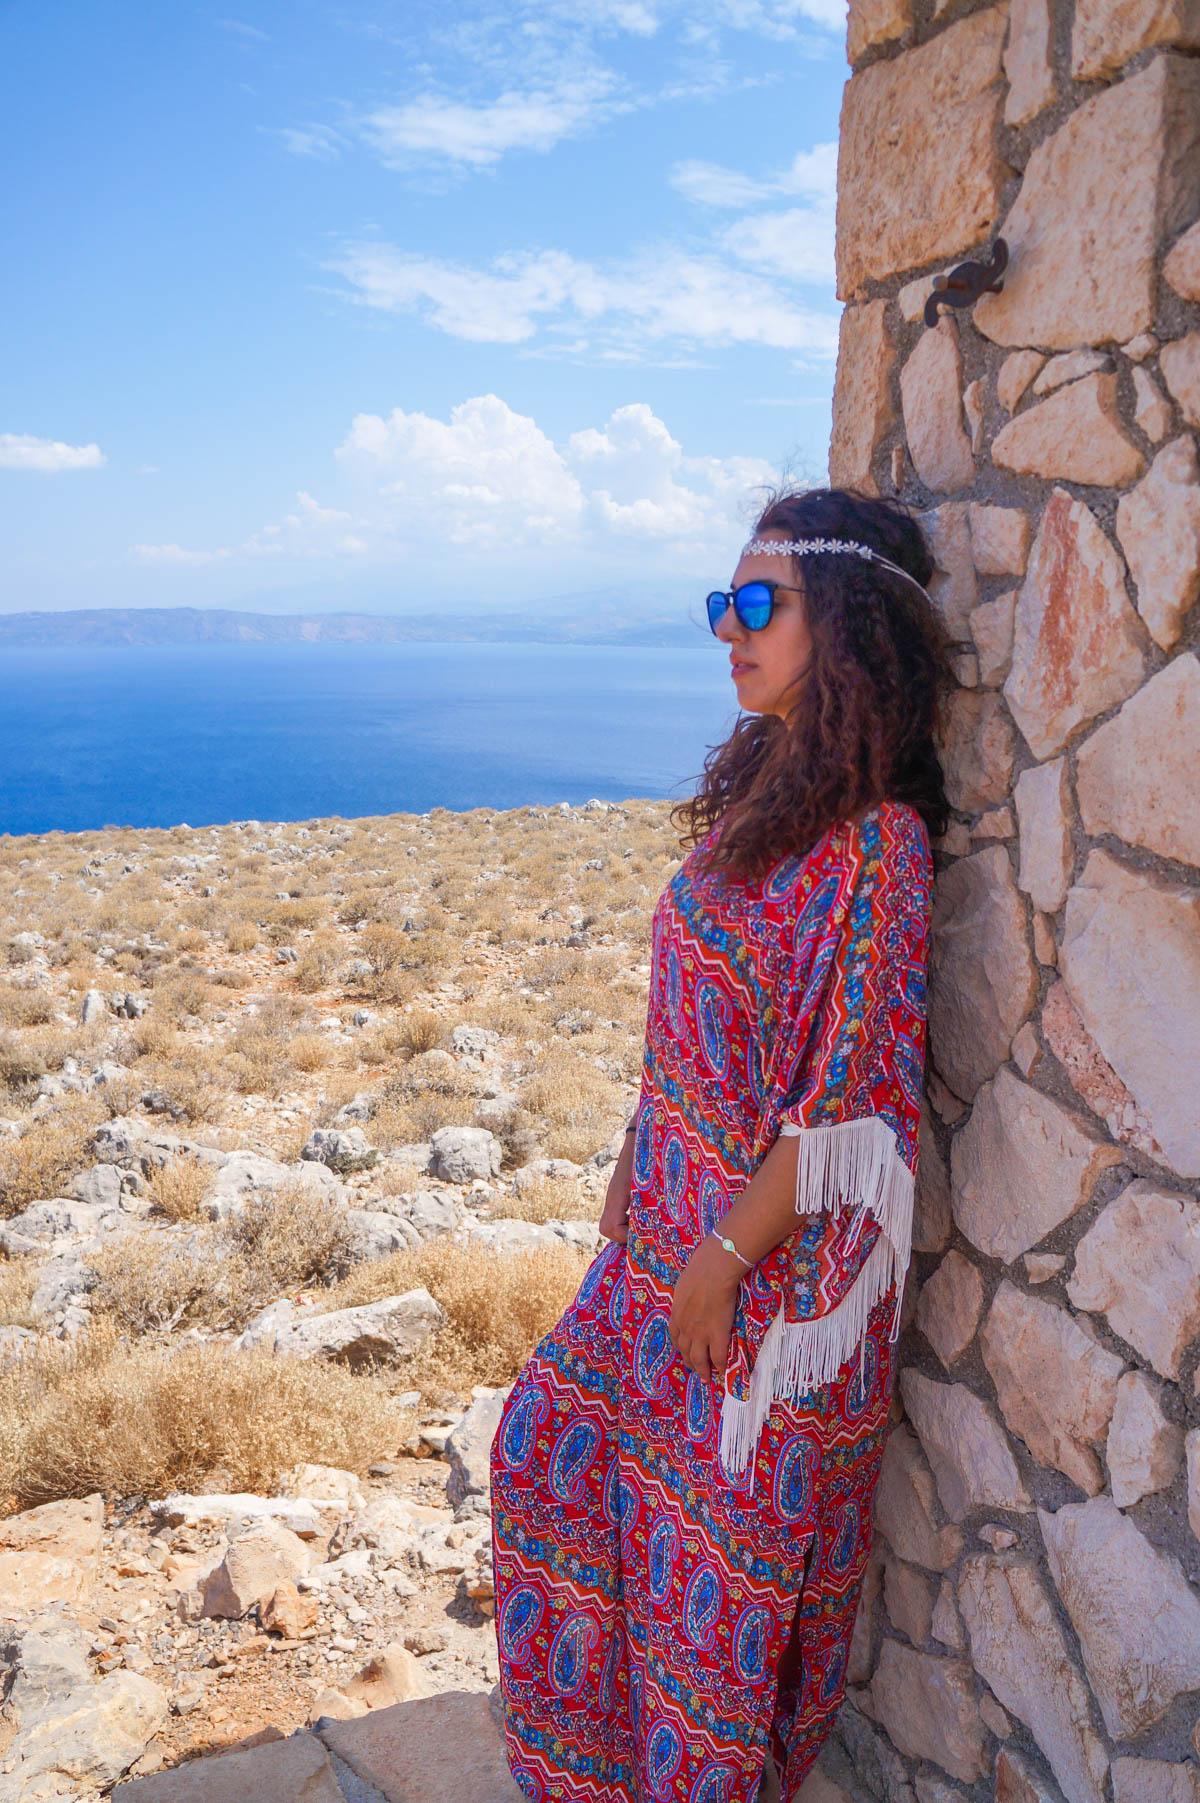 mpalos-beach-crete-greece-la-vie-en-blog-all-rights-reserved-21